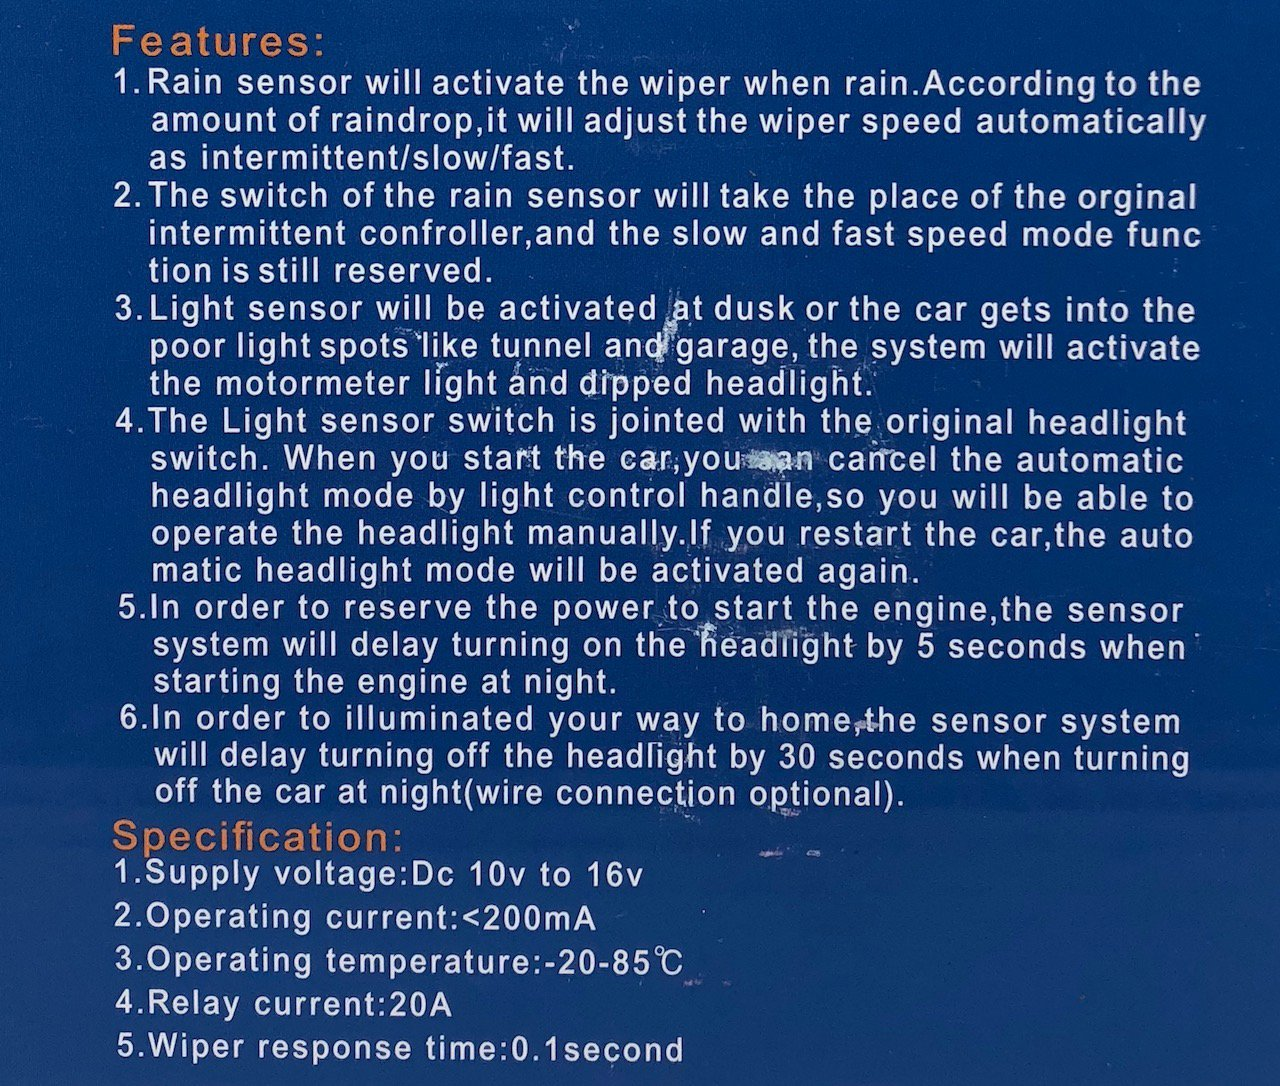 Sports Imports LLC Universal Automatic Car Rain Sensor and Light Sensor kit 2 in 1 Sensor by Sports Imports LLC